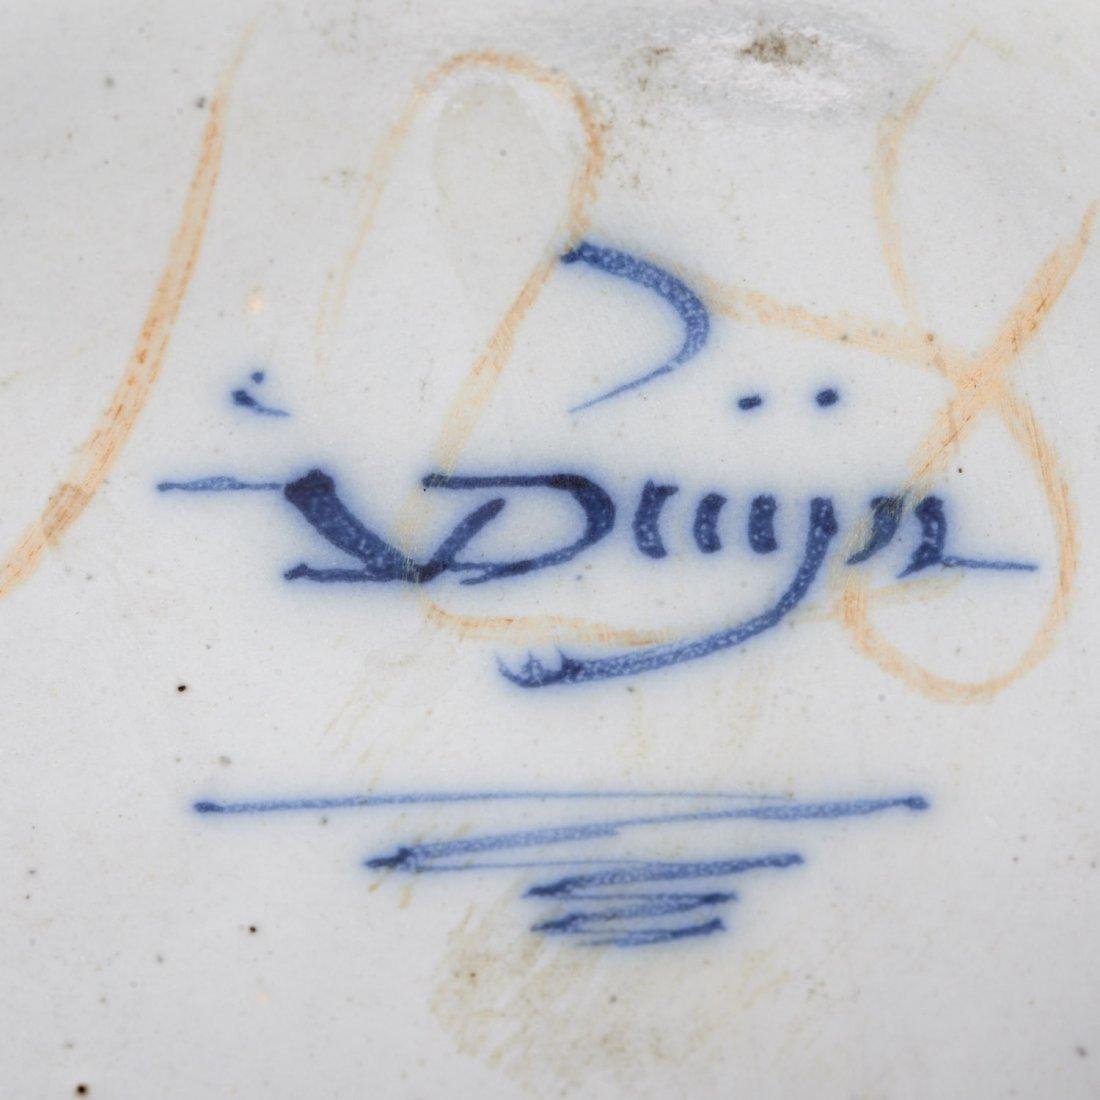 Delft (3) piece garniture signed Johannes Van Duyn - 9